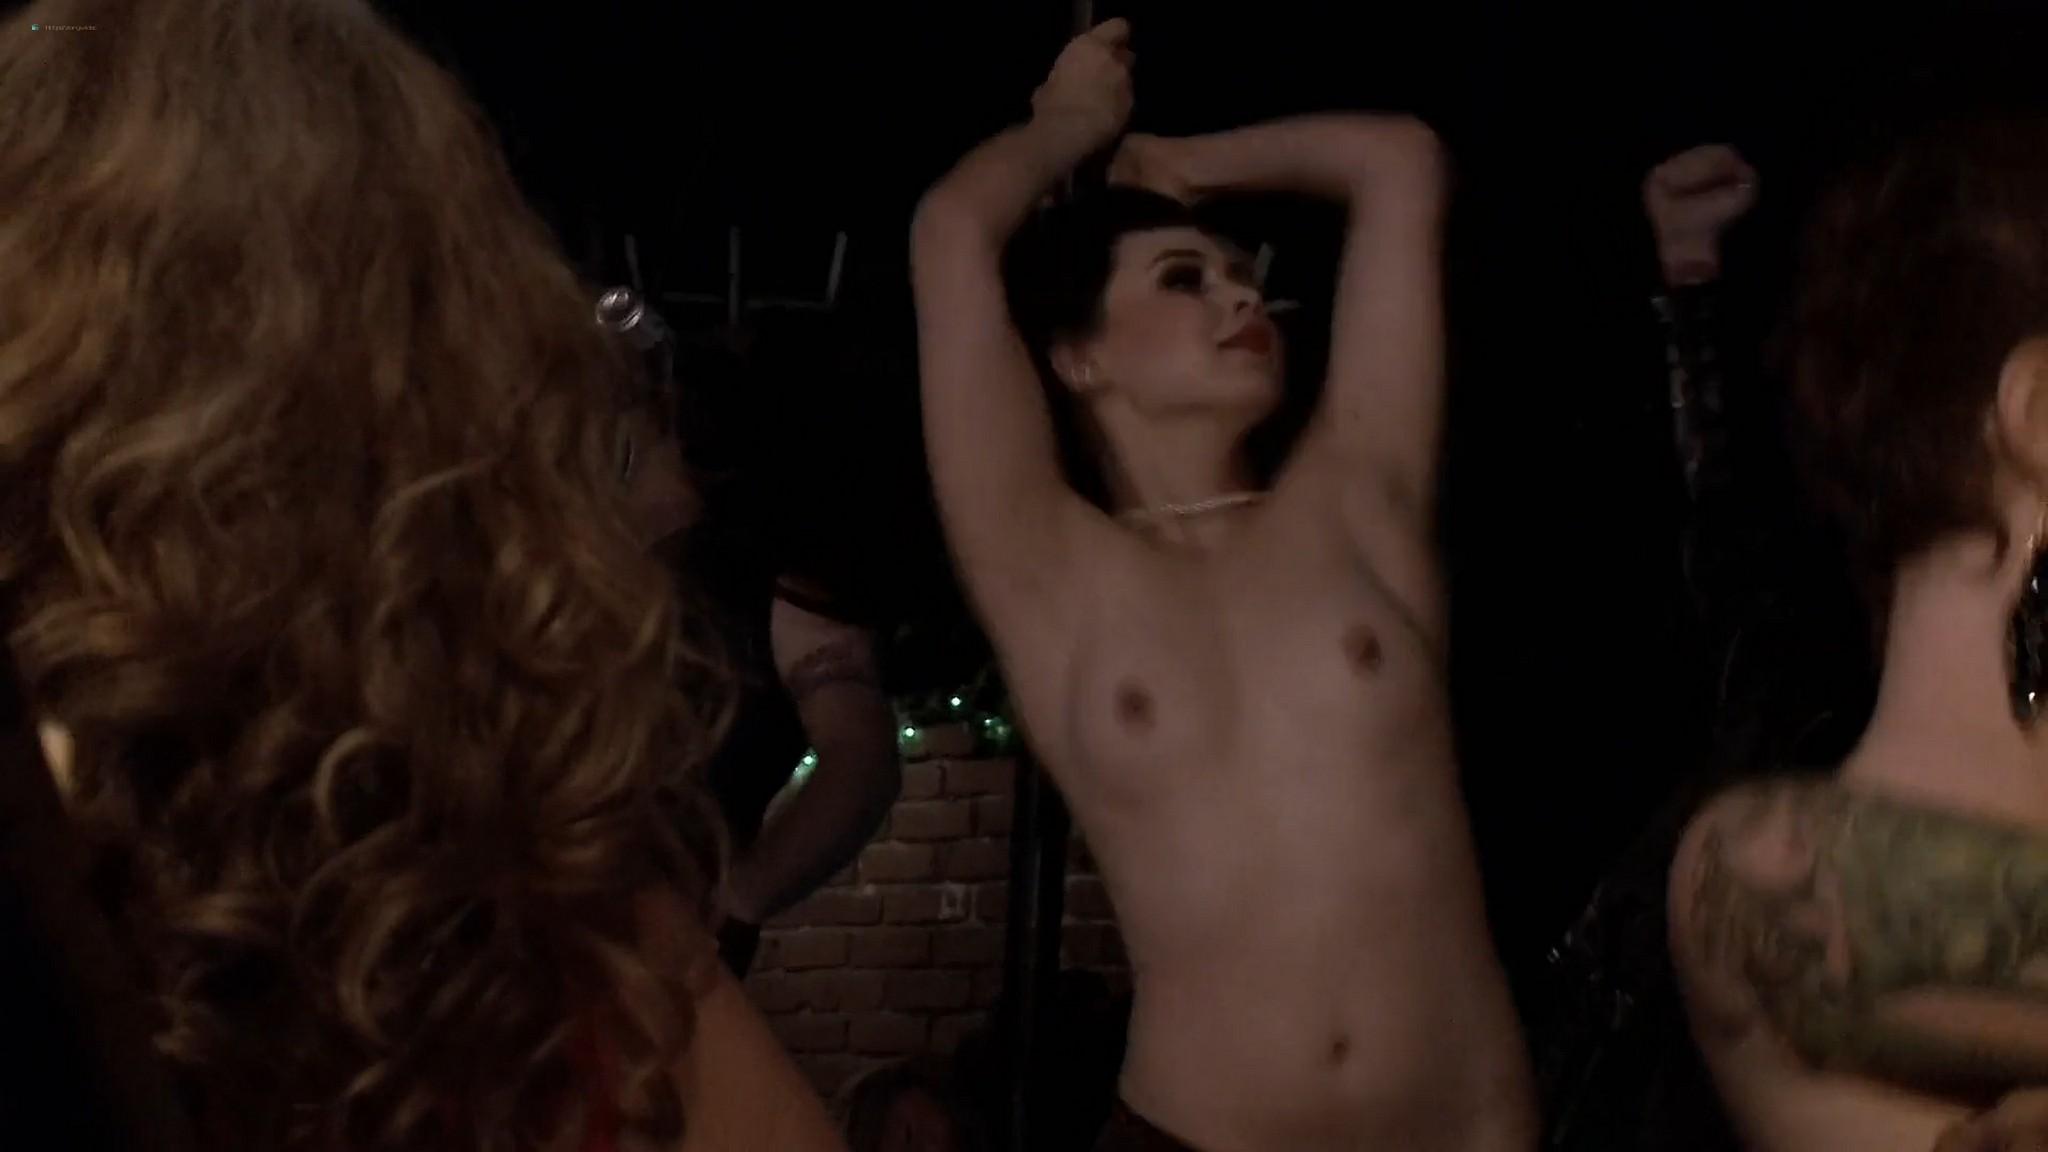 Taylor Cole hot sex Tiffany Shepis Francesca Brandelius naked The Violent Kind 2010 HD 1080p BluRay 009